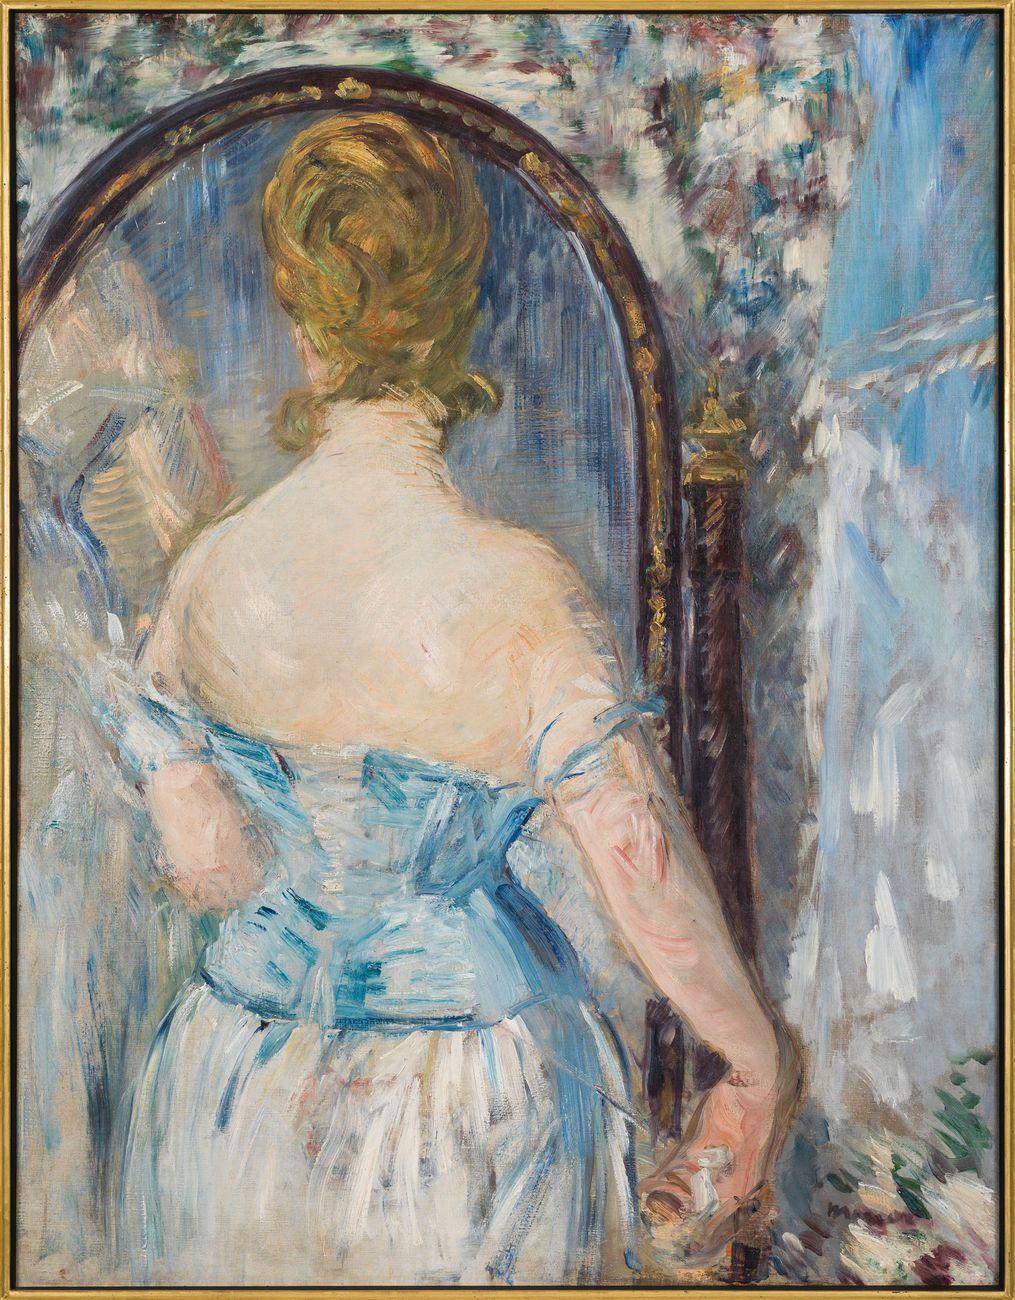 Édouard Manet, Devant la glace, 1876. Solomon R. Guggenheim Museum, New York. Thannhauser Collection, Donazione Justin K. Thannhauser © Solomon R. Guggenheim Foundation, New York (SRGF)